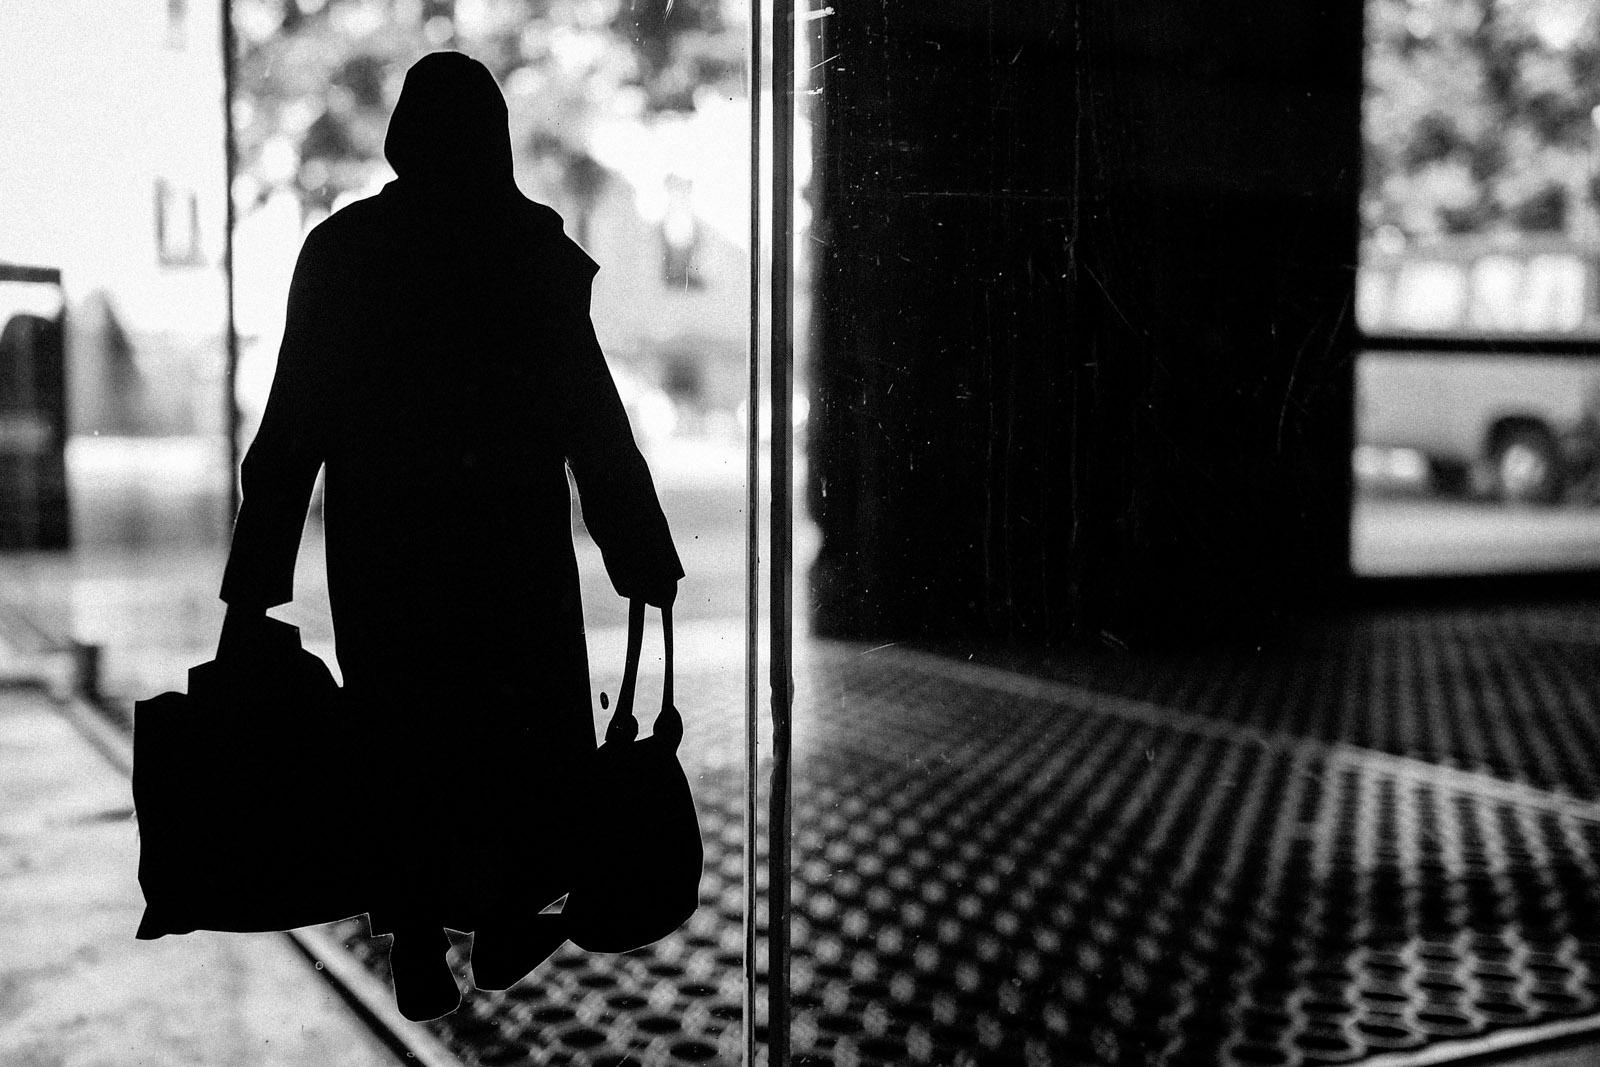 silhouette, homeless